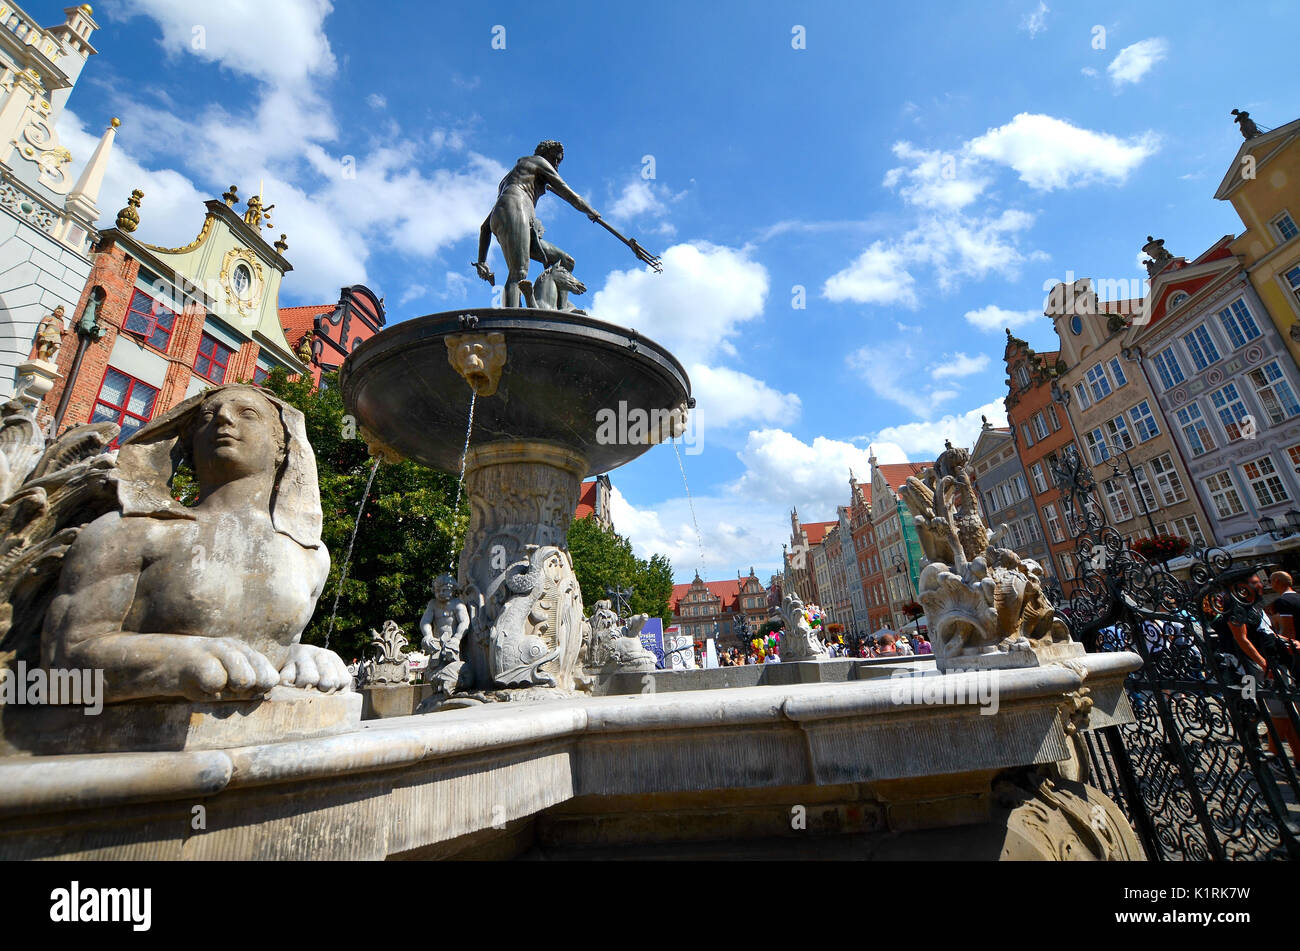 Neptune's Fountain, Gdansk, Poland Stock Photo